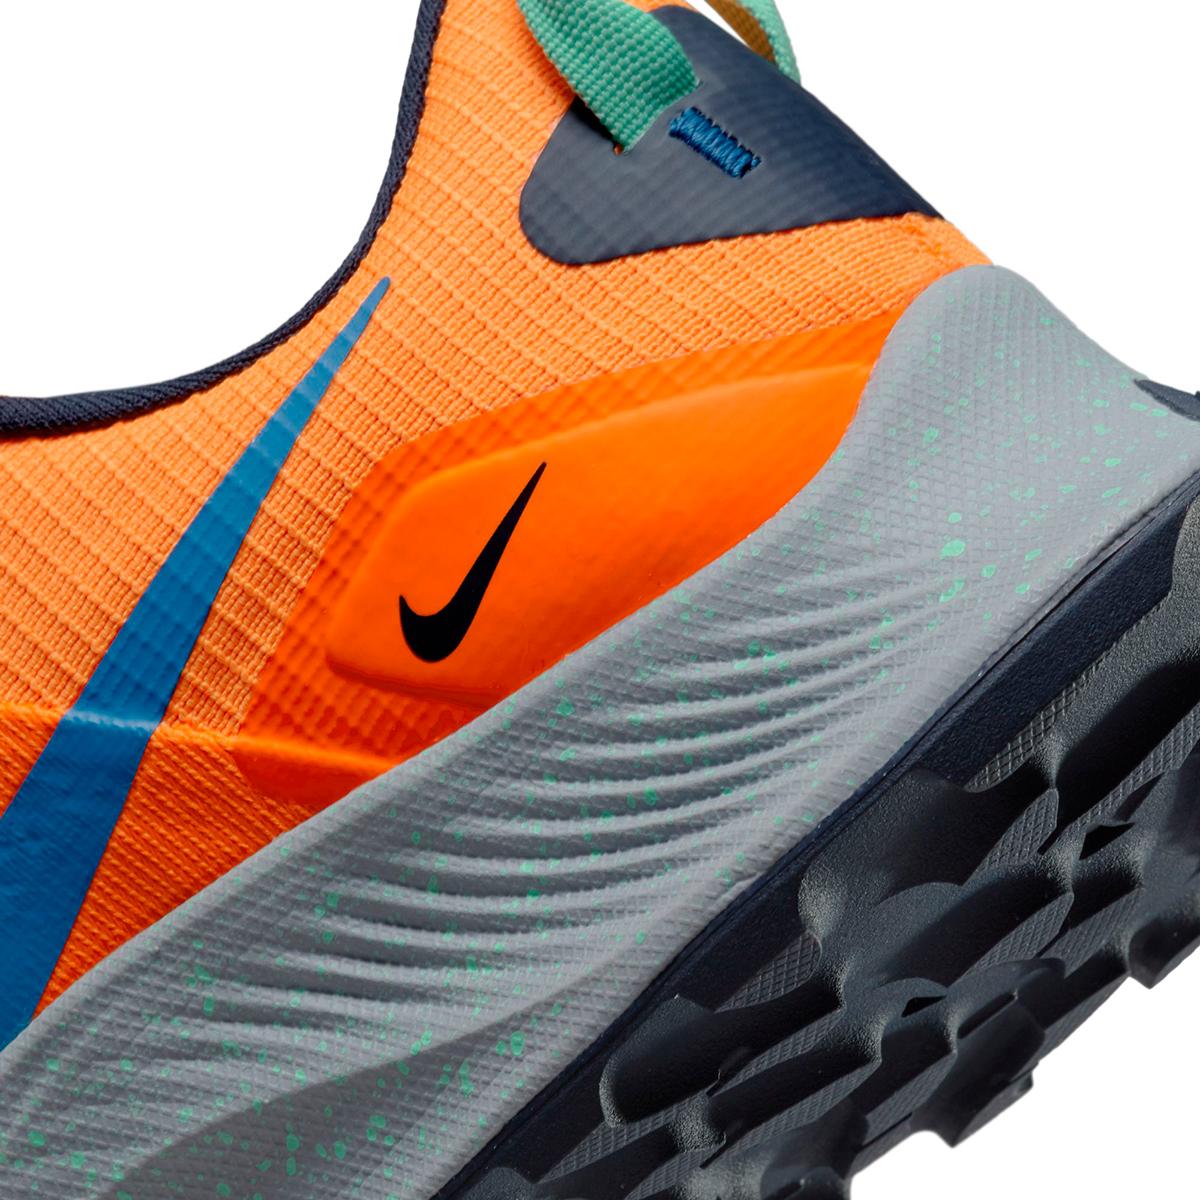 Men's Nike Pegasus Trail 3 Trail Running Shoe - Color: Total Orange/Signal Blue/Wolf Grey - Size: 6 - Width: Regular, Total Orange/Signal Blue/Wolf Grey, large, image 5